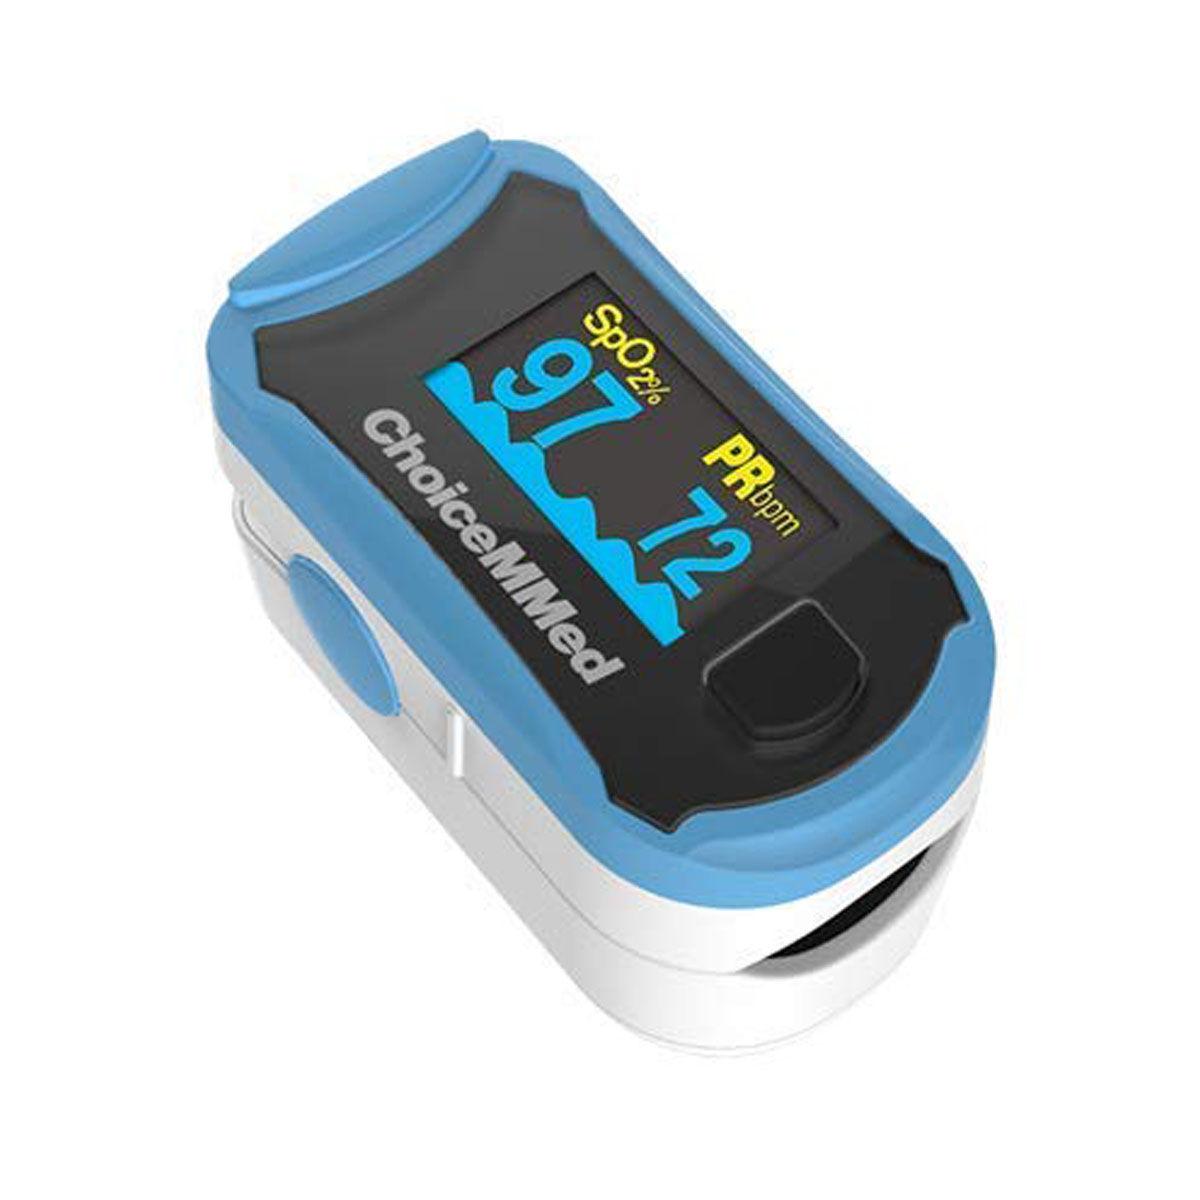 Choicemmed Foley Catheter Holder Paediatric पल्स Oximeter